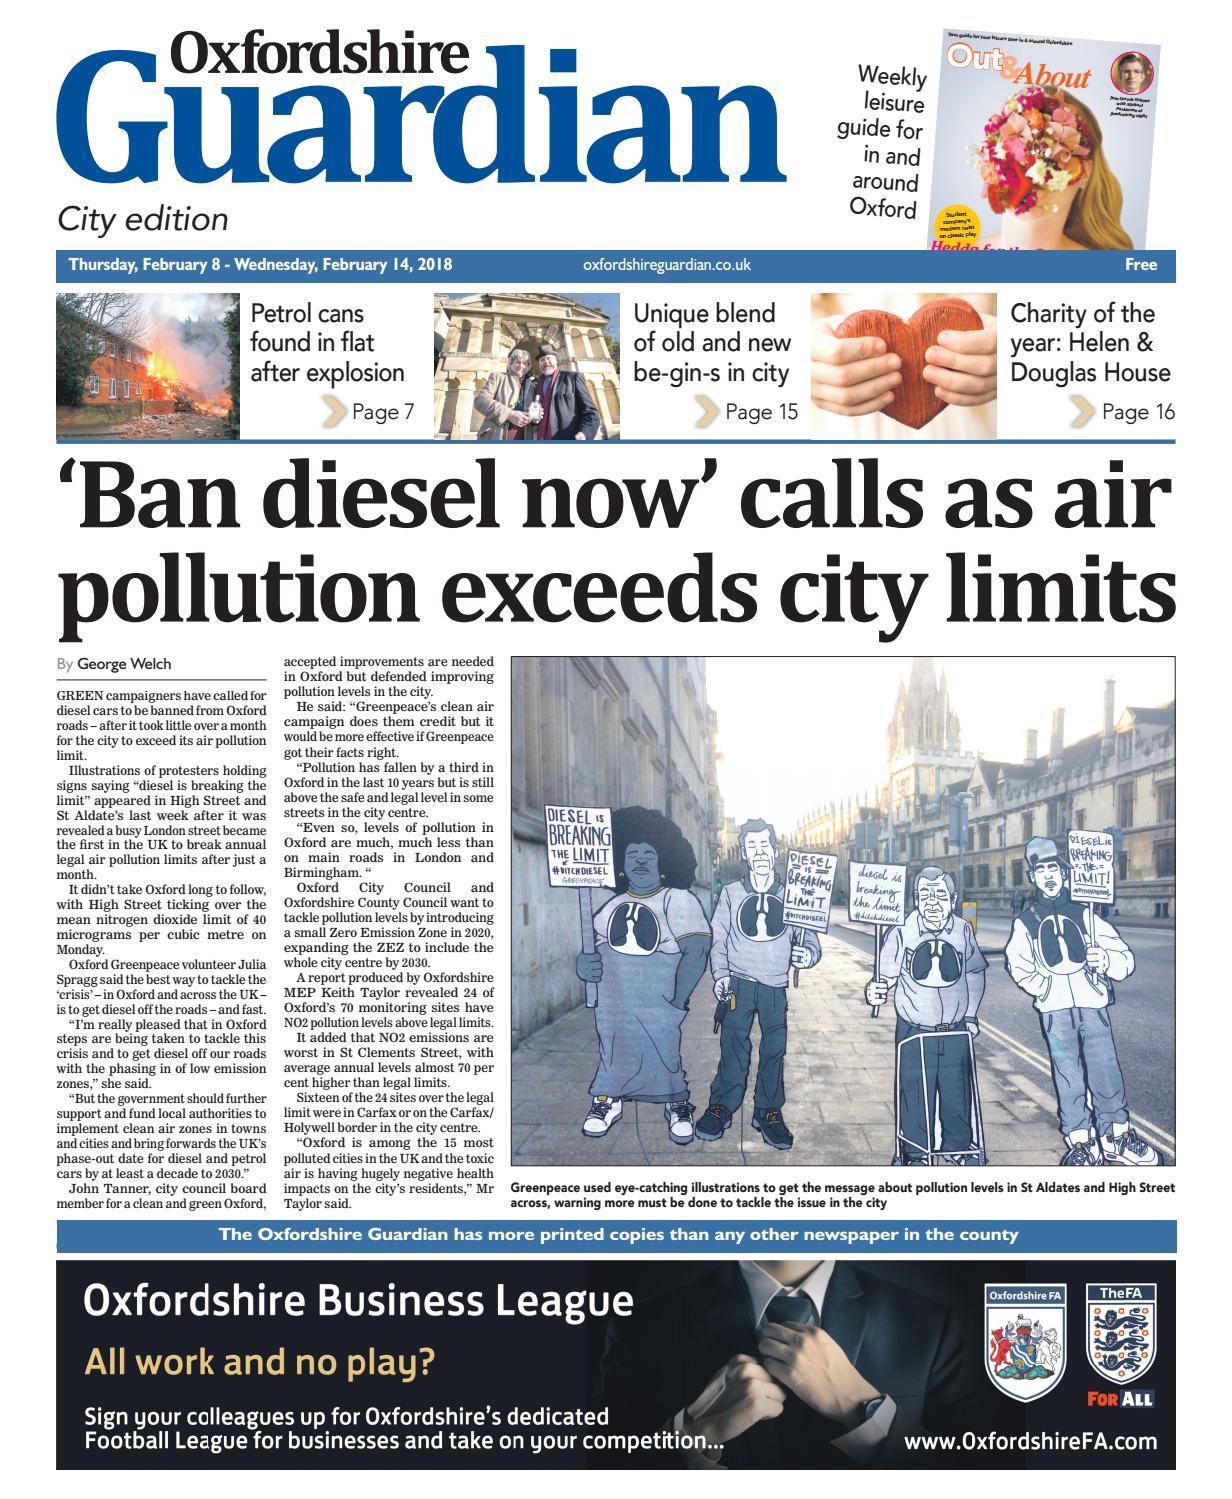 08 february 2018 oxfordshire guardian city